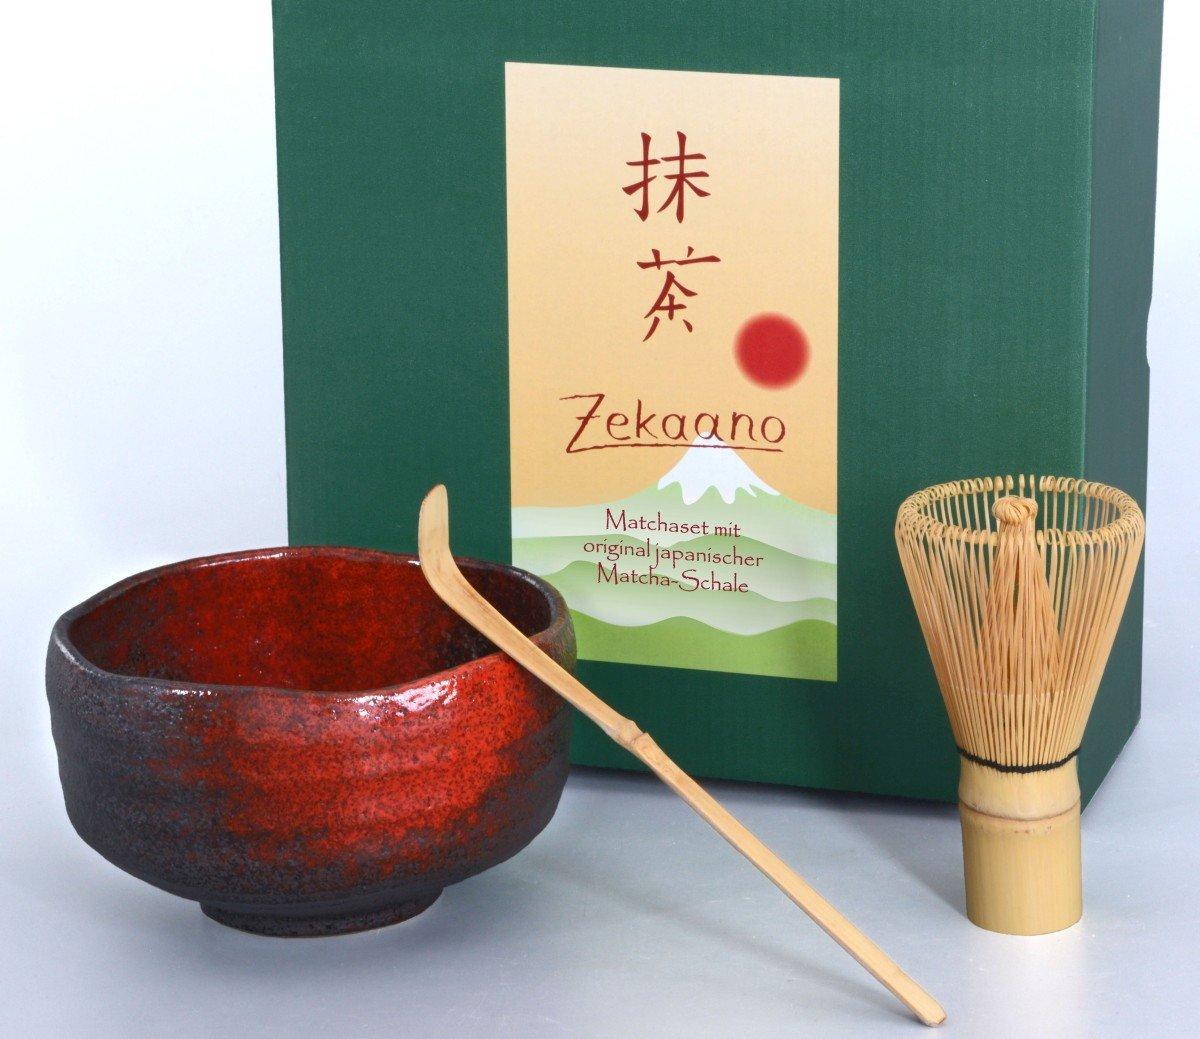 zekaano Matcha–Original Bol à matcha Chawan 500ml japonais avec matchabesen Chasen et cuillère en bambou Chas Haku, traditionnel, noir/rouge, Ø 13cm, fait main Aricola